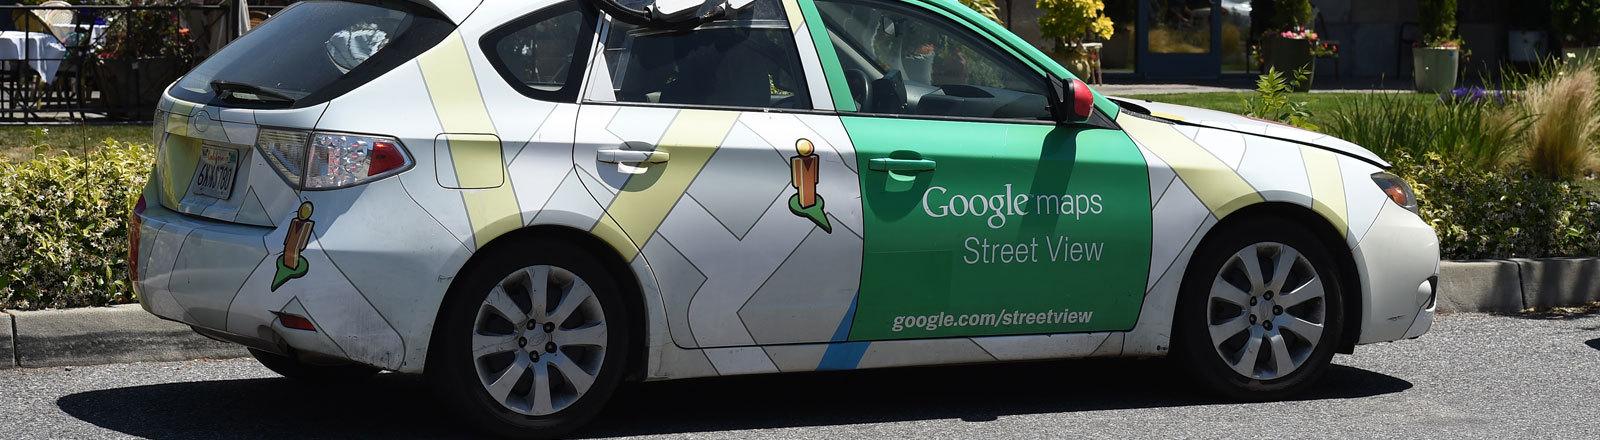 Google Street View Auto